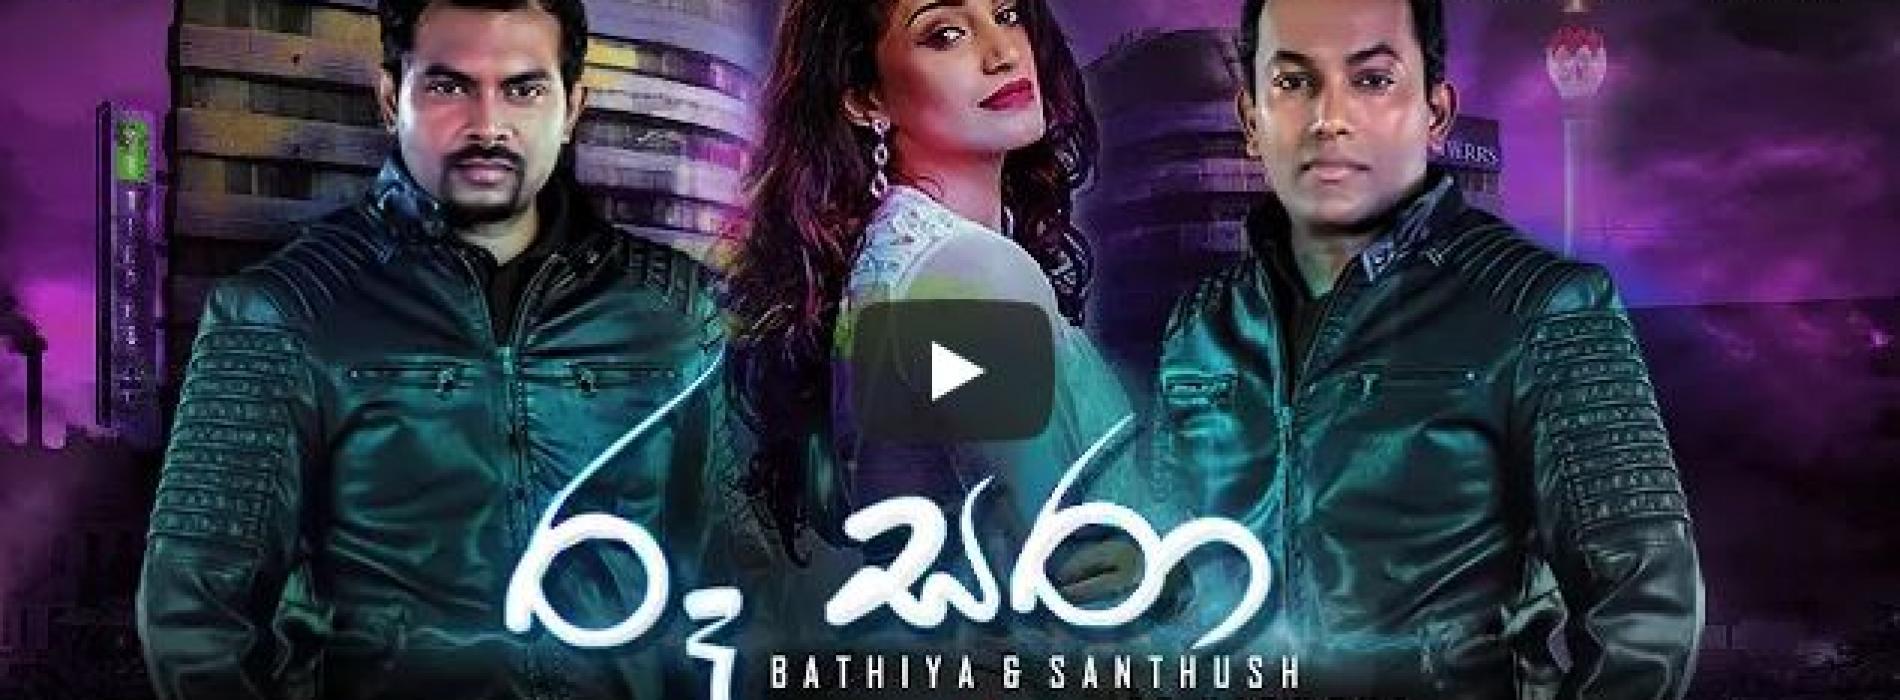 News : Bathiya N Santhush – Roo Sara Official Music Video Trailer